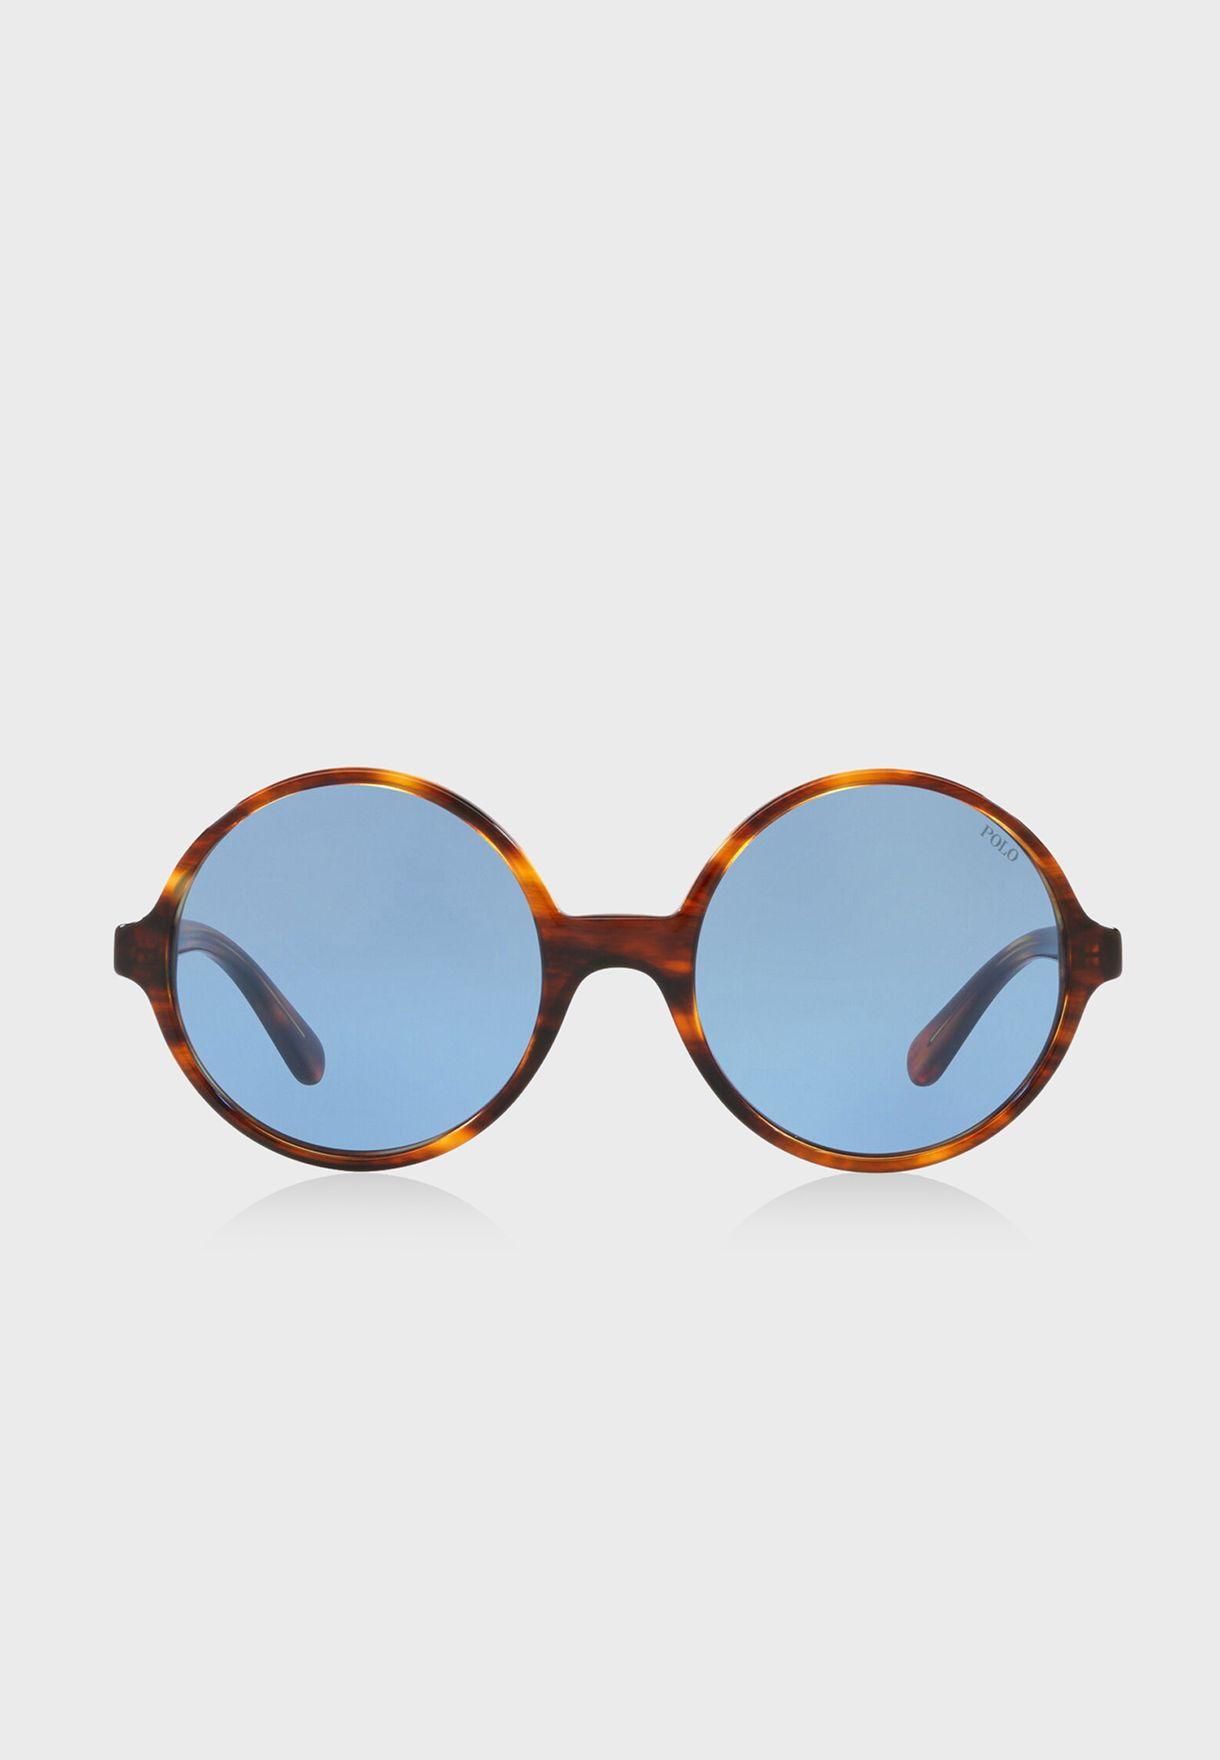 6bbb2b62e519 Shop Polo Ralph Lauren prints Round Sunglasses 8.05E+12 for Women in ...